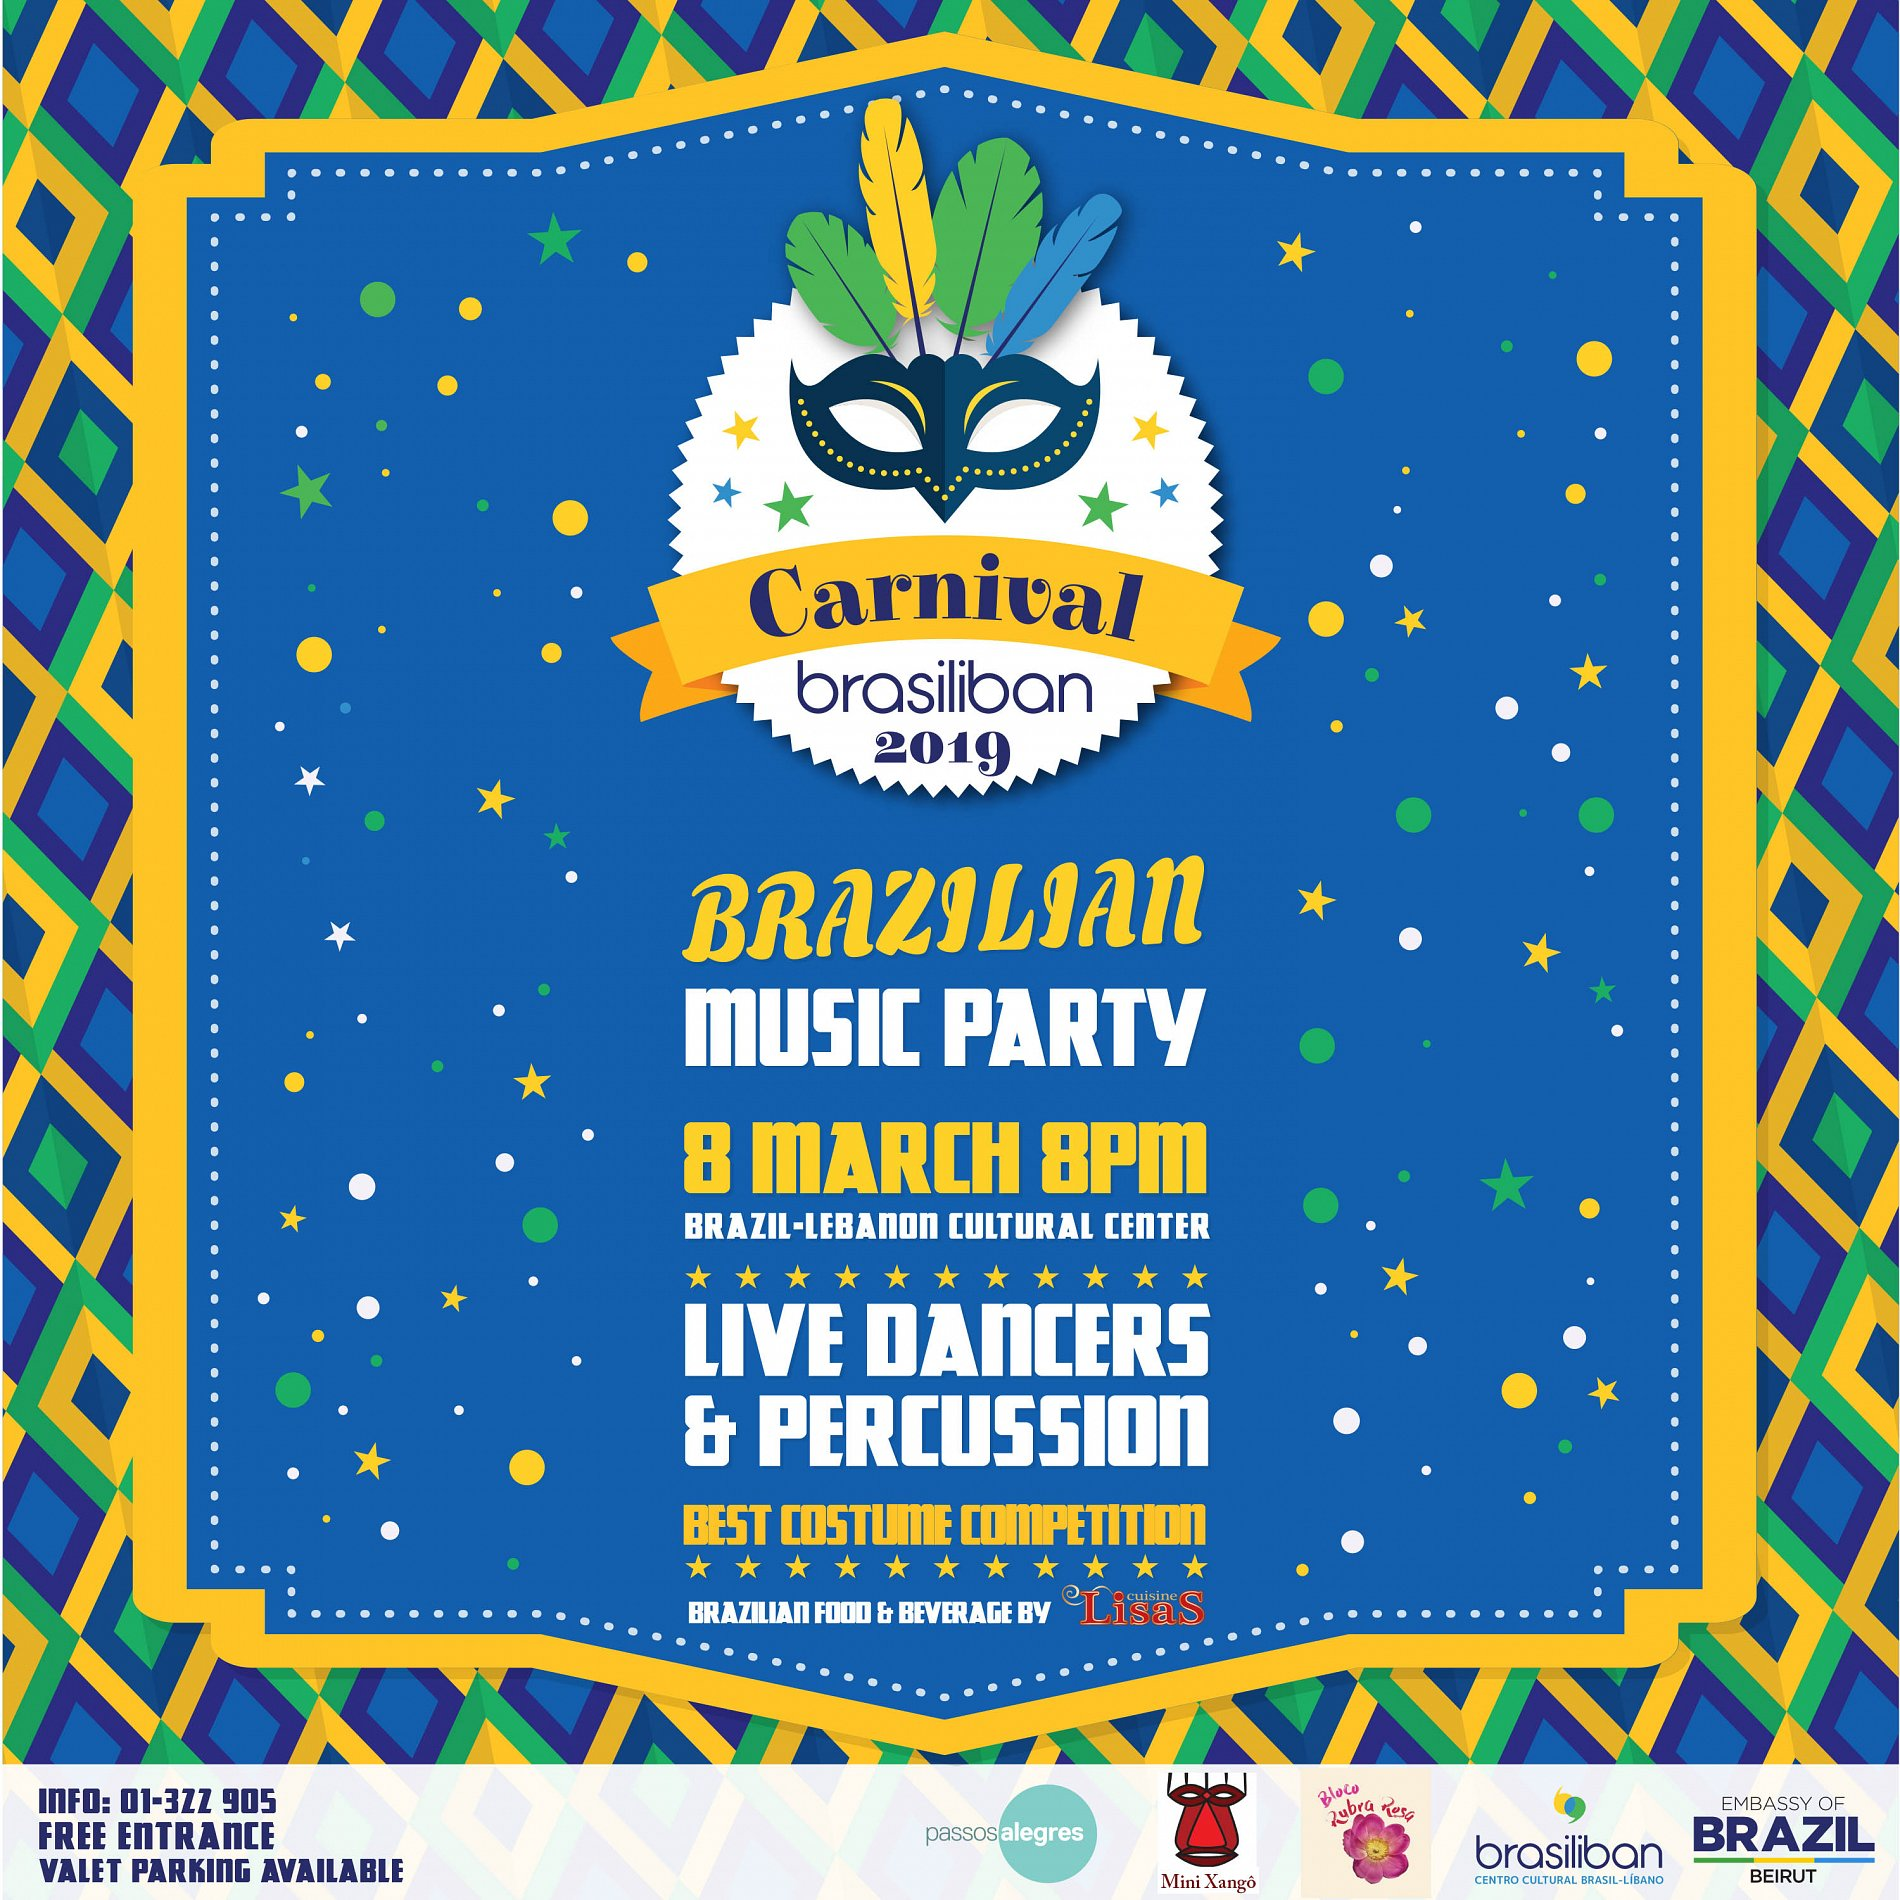 Carnival Brasiliban 2019 « Lebtivity